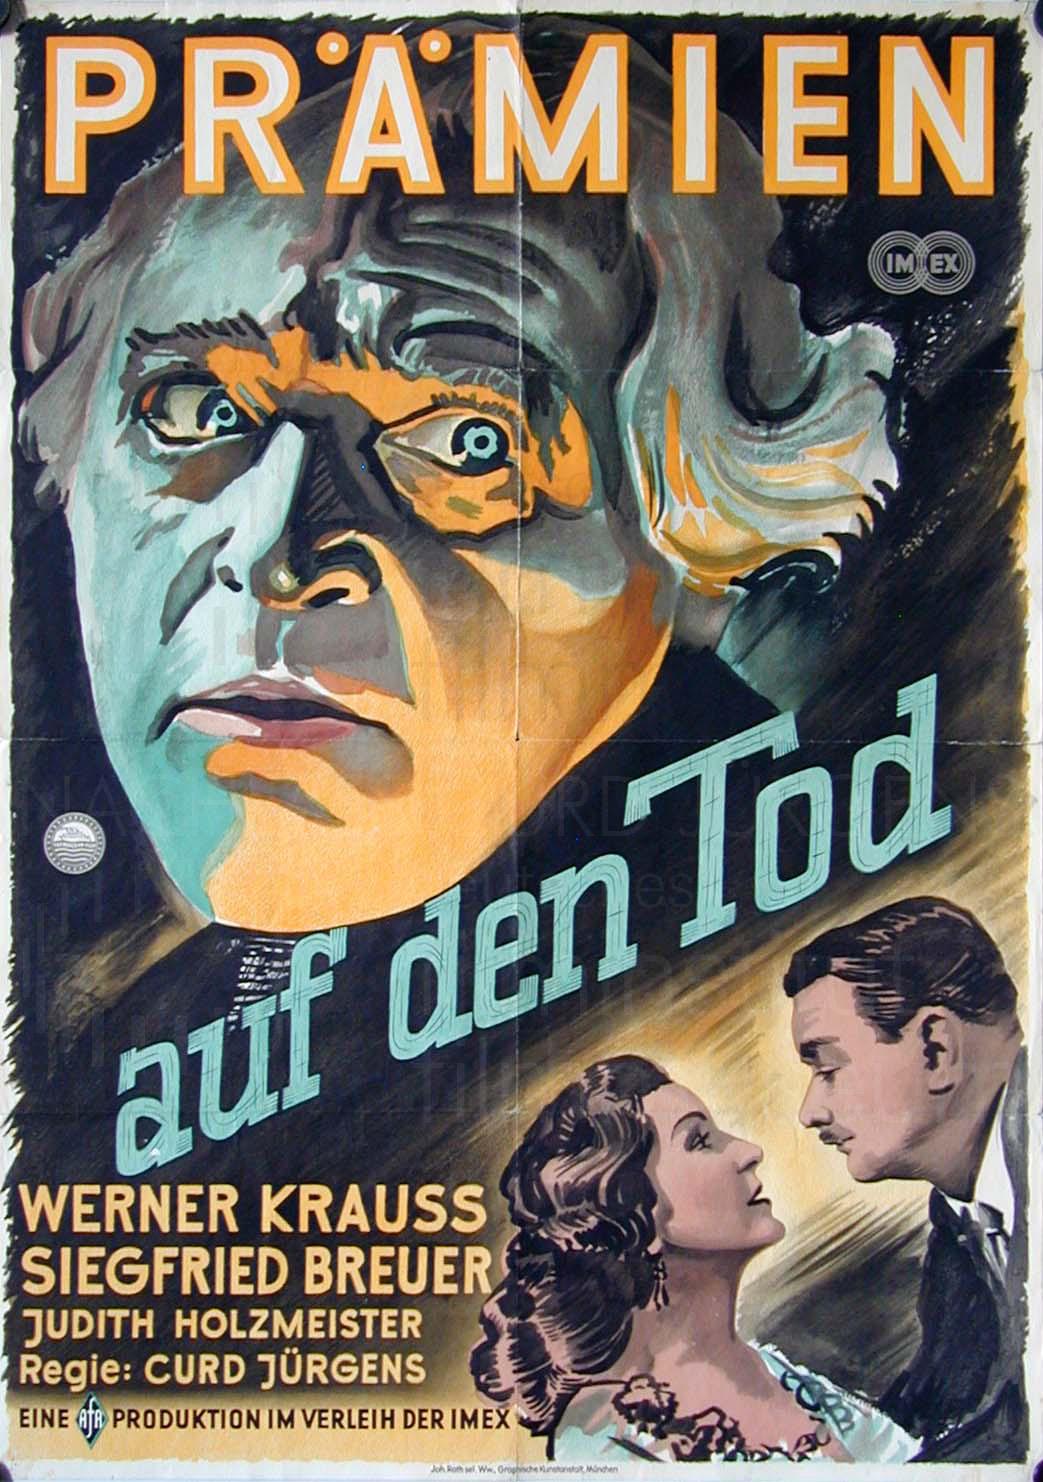 PRÄMIEN AUF DEN TOT (1950)